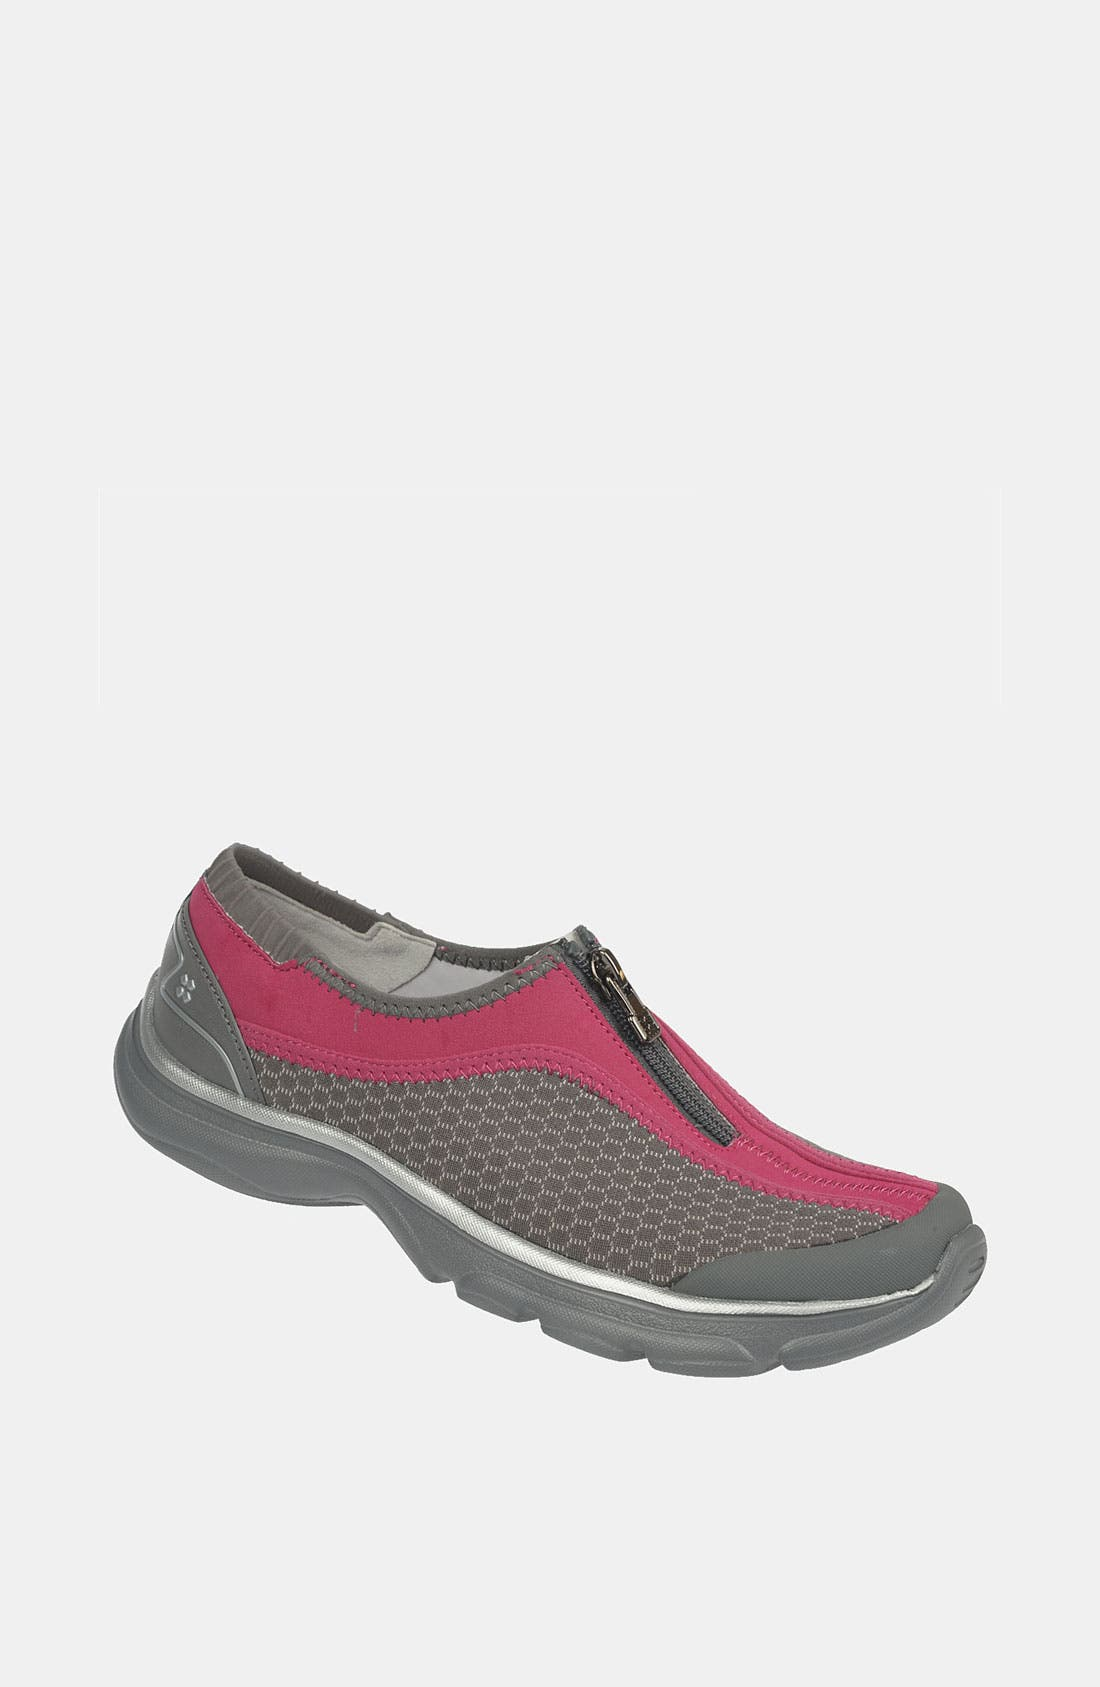 Main Image - Naturalizer 'BZees - Drive In' Walking Shoe